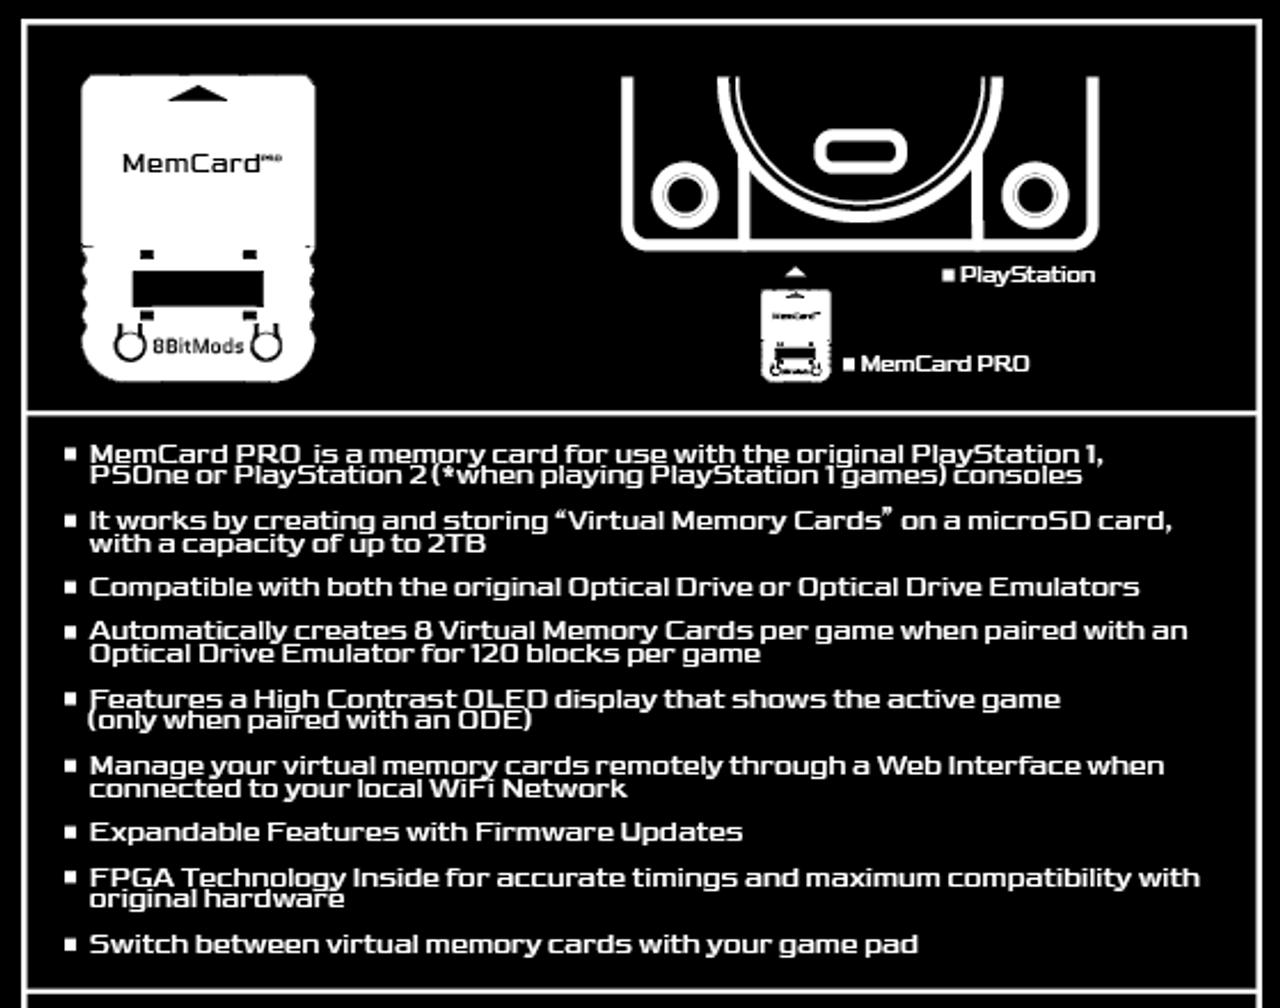 [Preorder] MemCard PRO for PlayStation 1